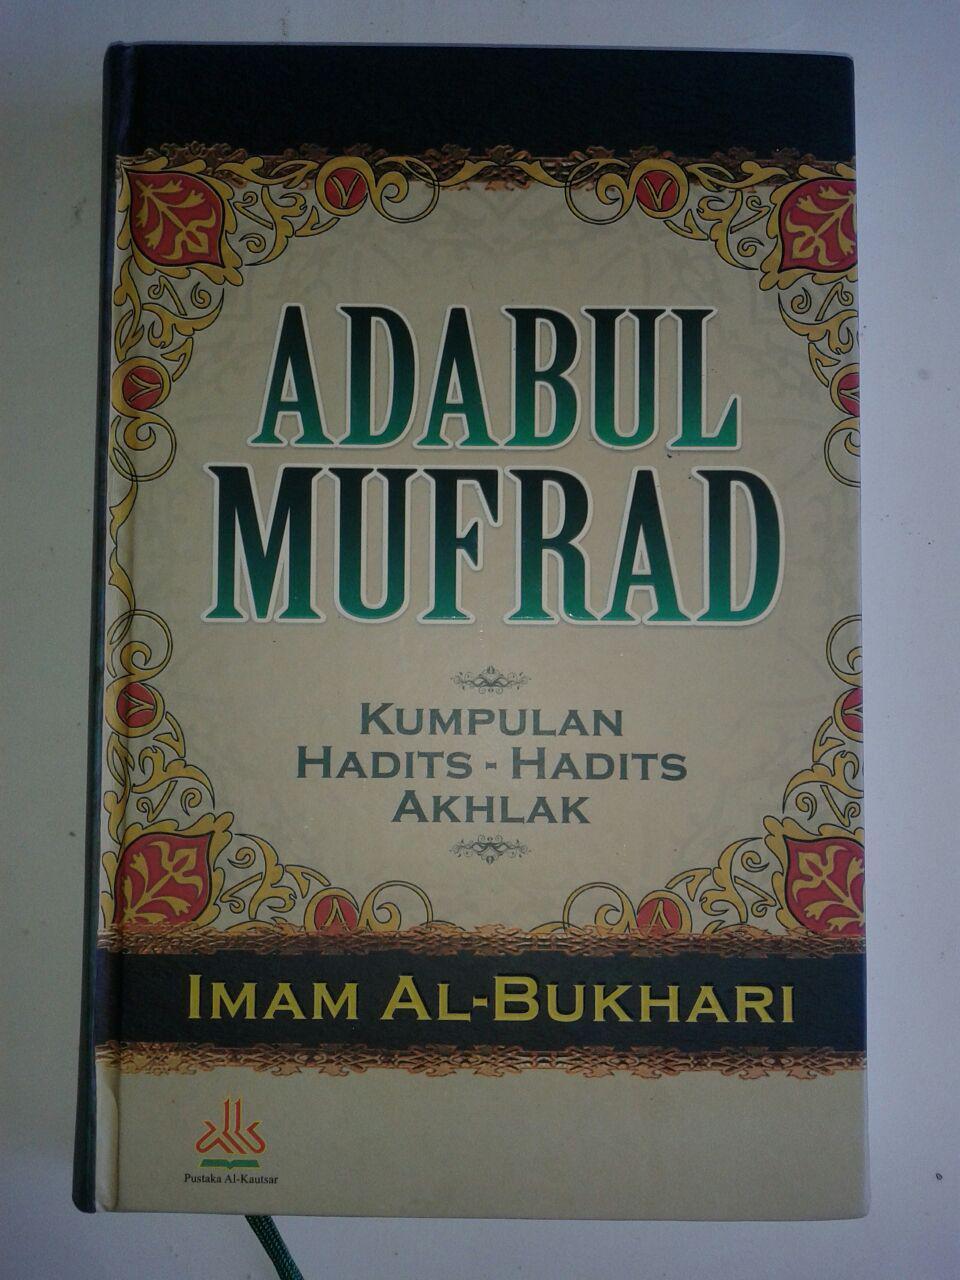 Buku Adabul Mufrad Kumpulan Hadits-Hadits Akhlak cover 2